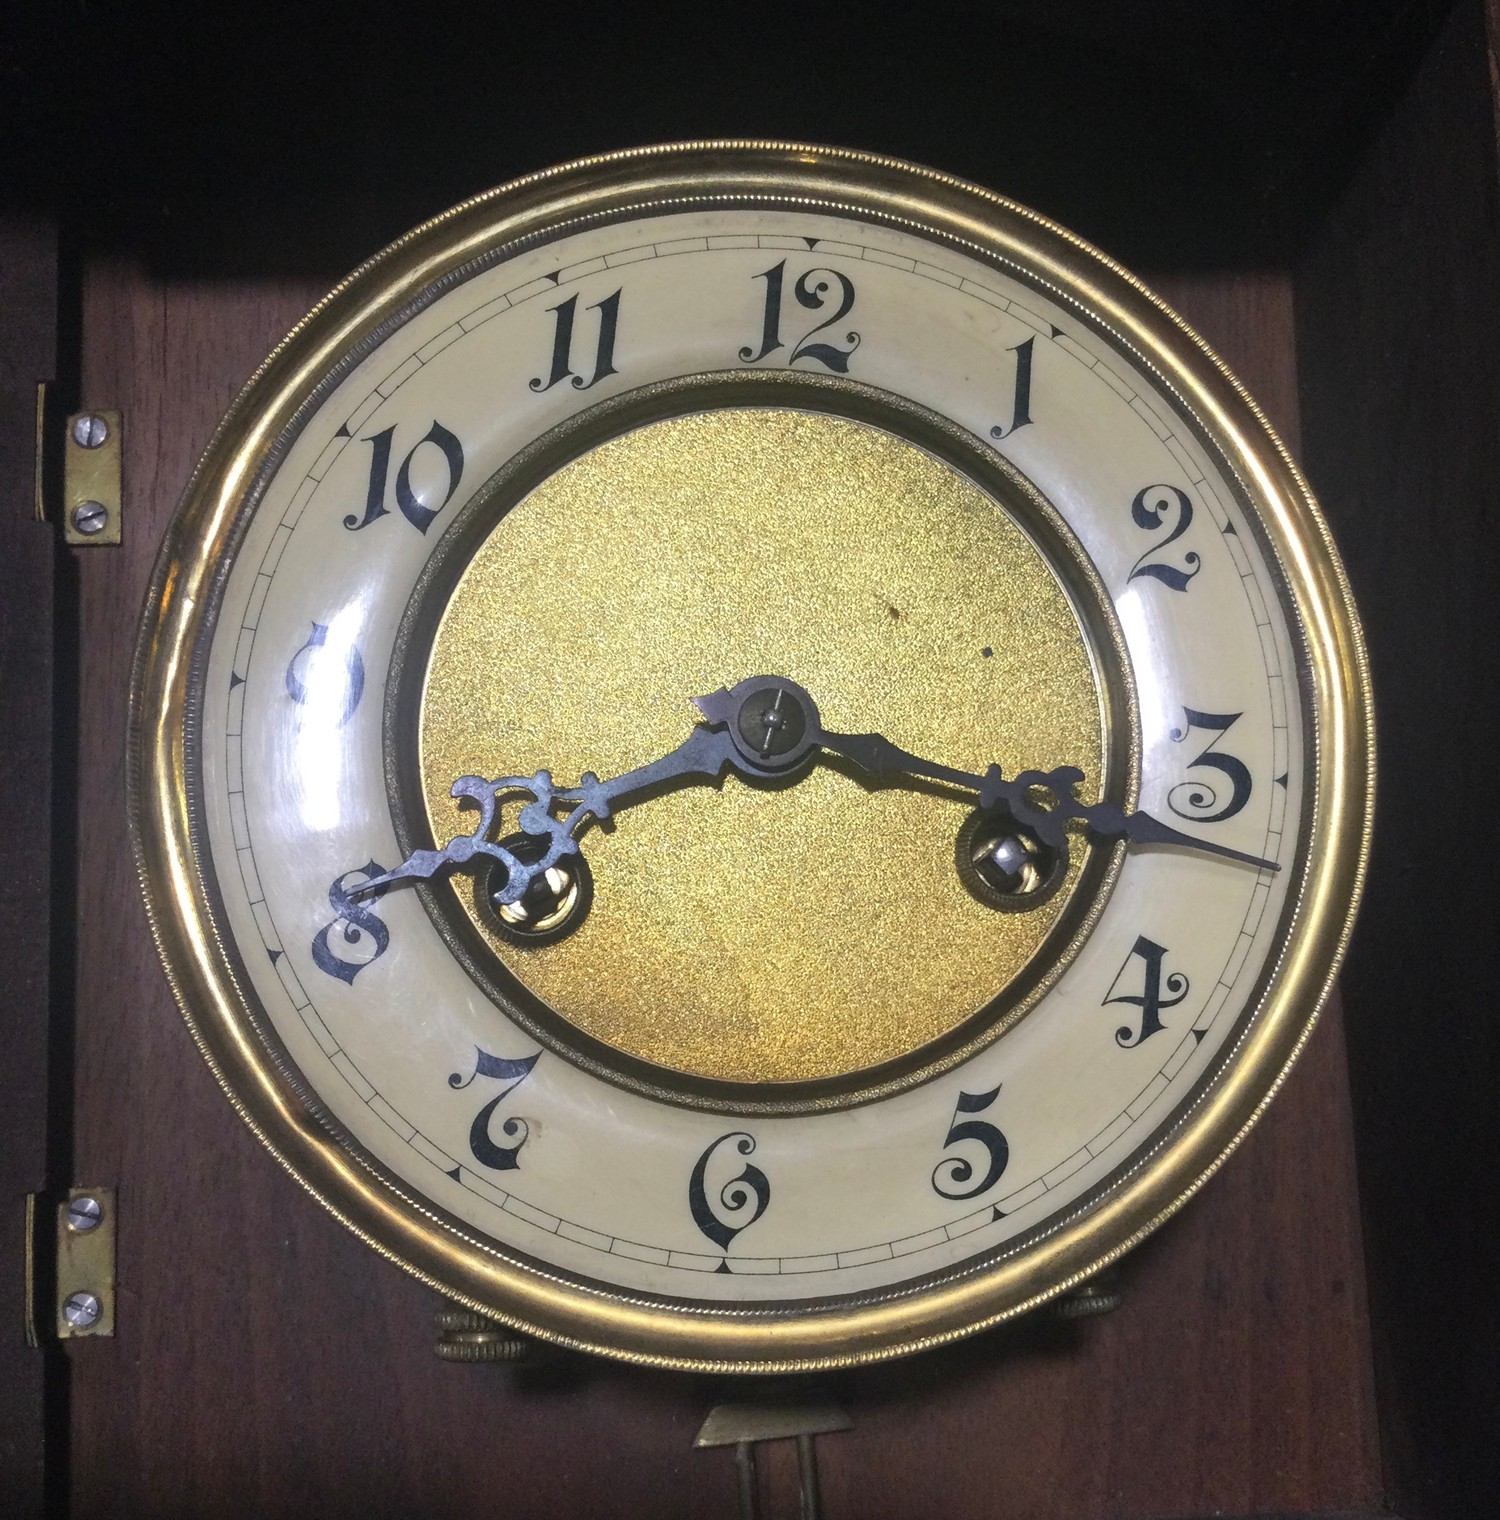 Mahogany striking wall clock with pendulum - Image 5 of 6